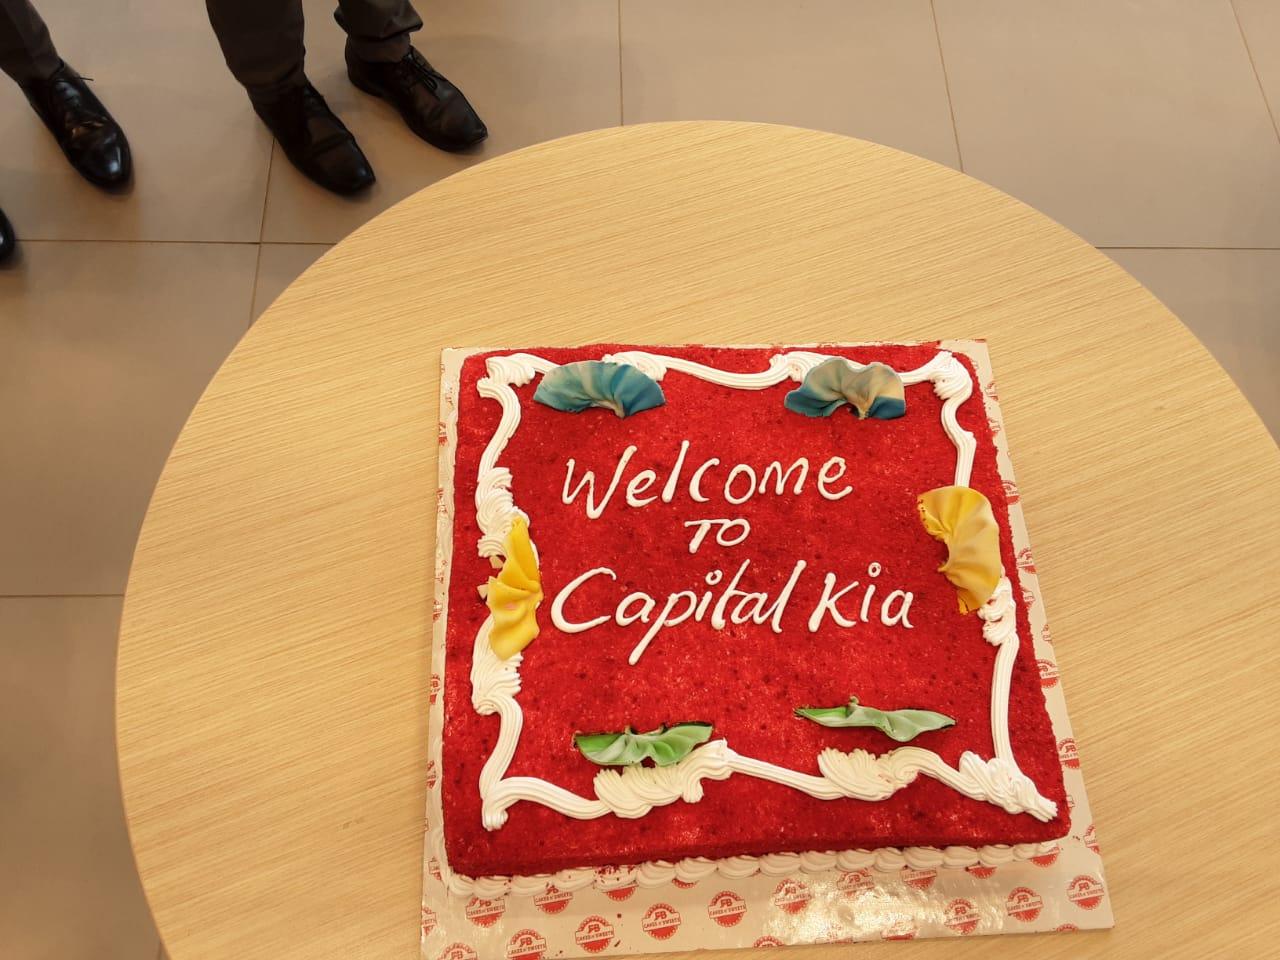 Capital Kia